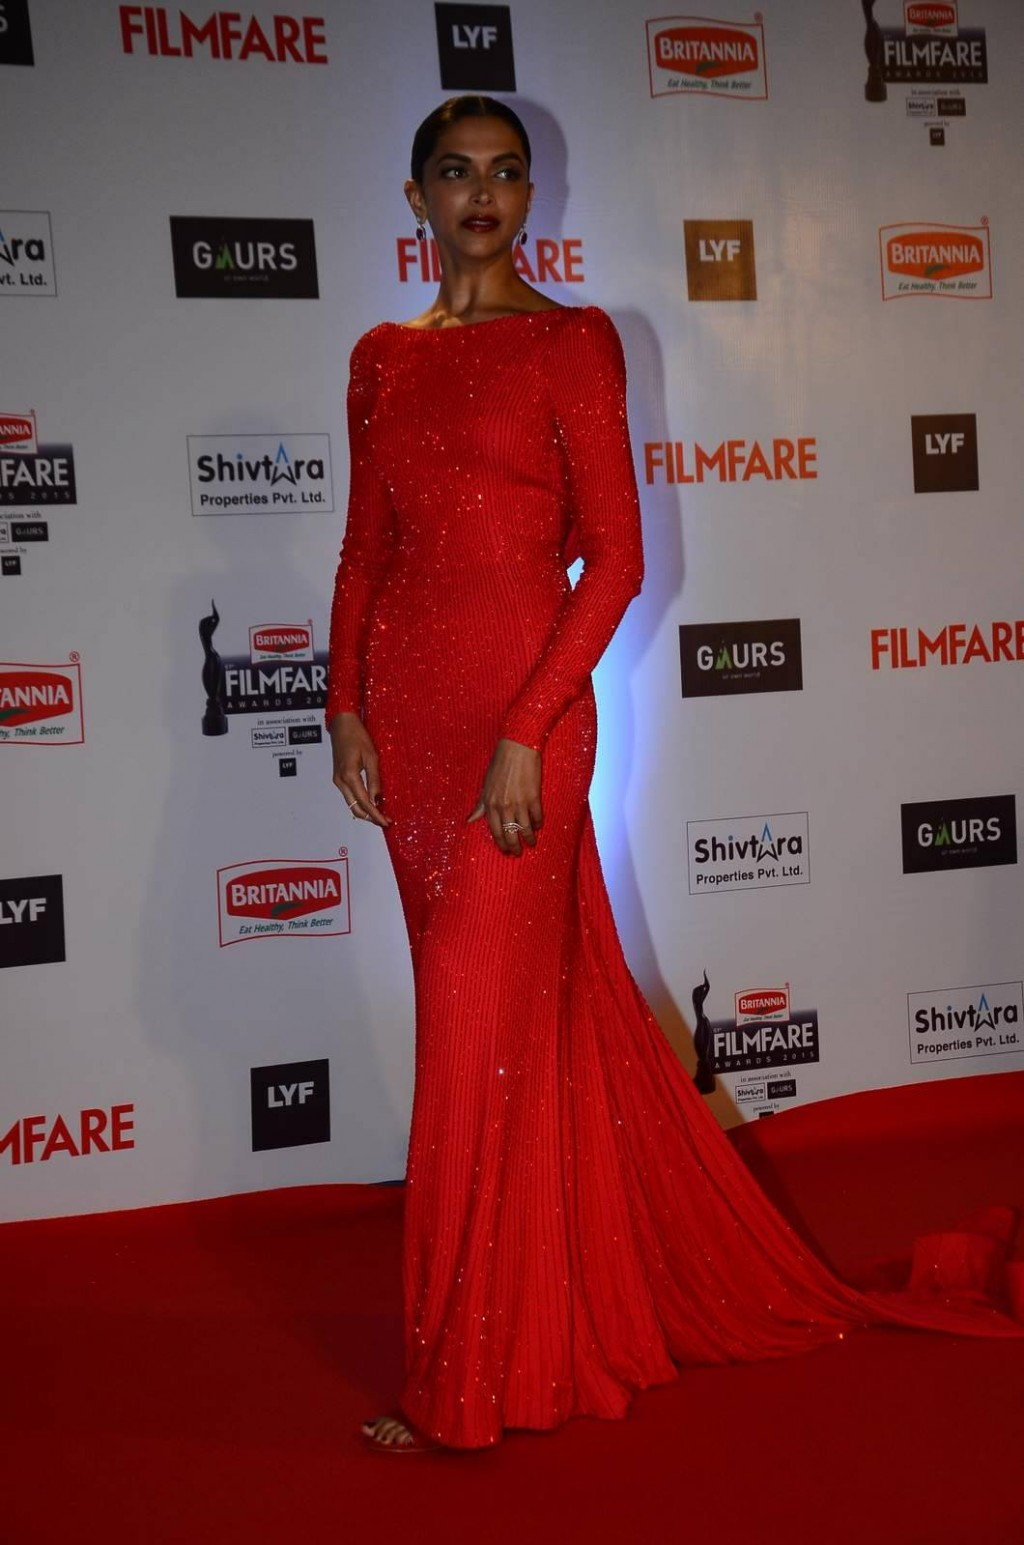 deepika-padukone-wears-ralph-russo-to-61st-britannia-filmfare-awards